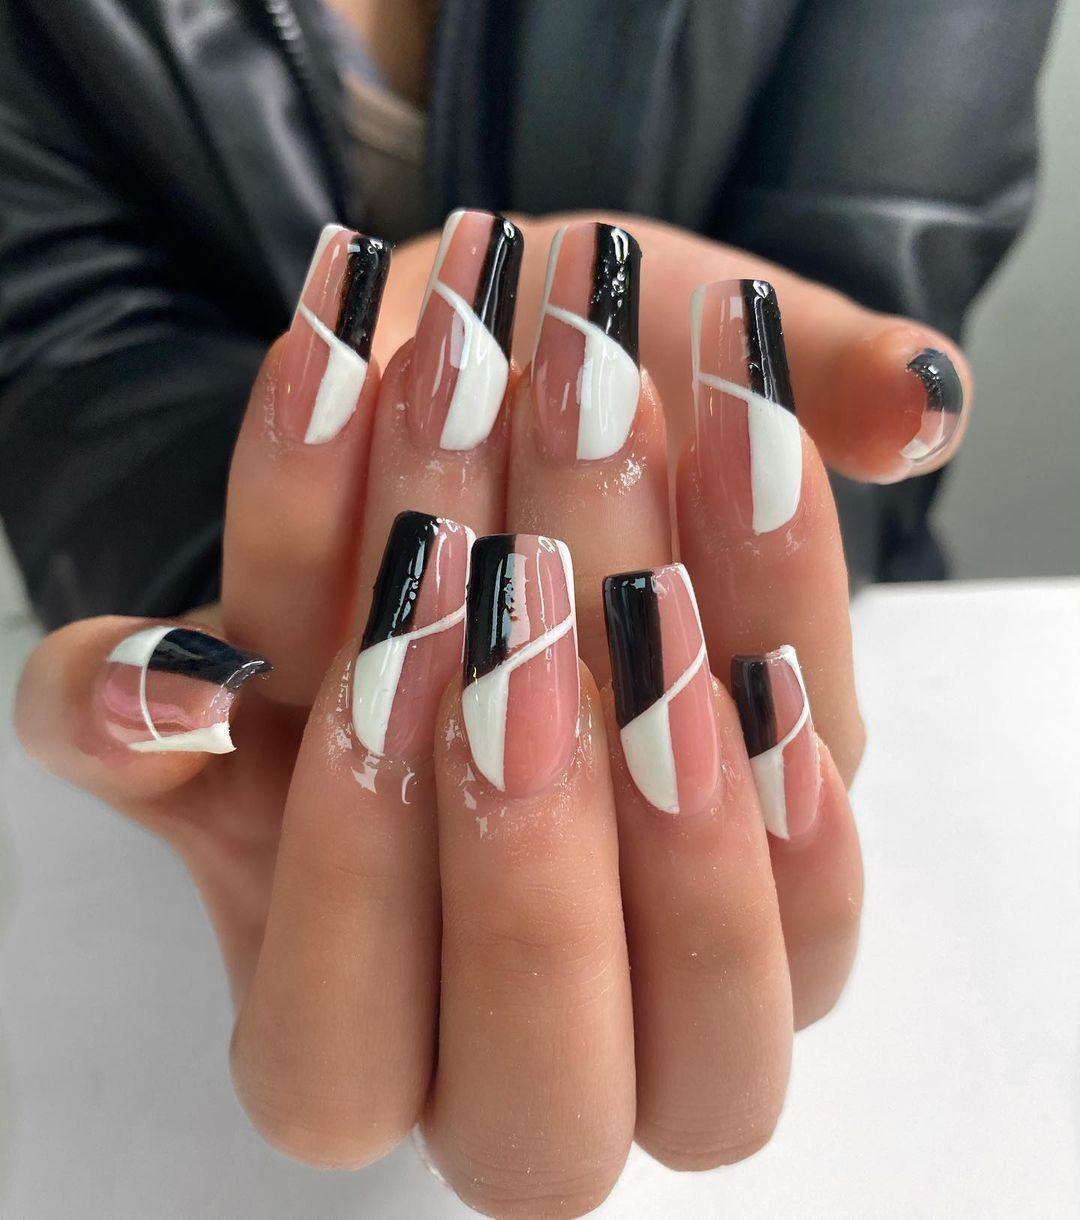 Mega close up #gelpolish #naturalnails #matte #pink #nails